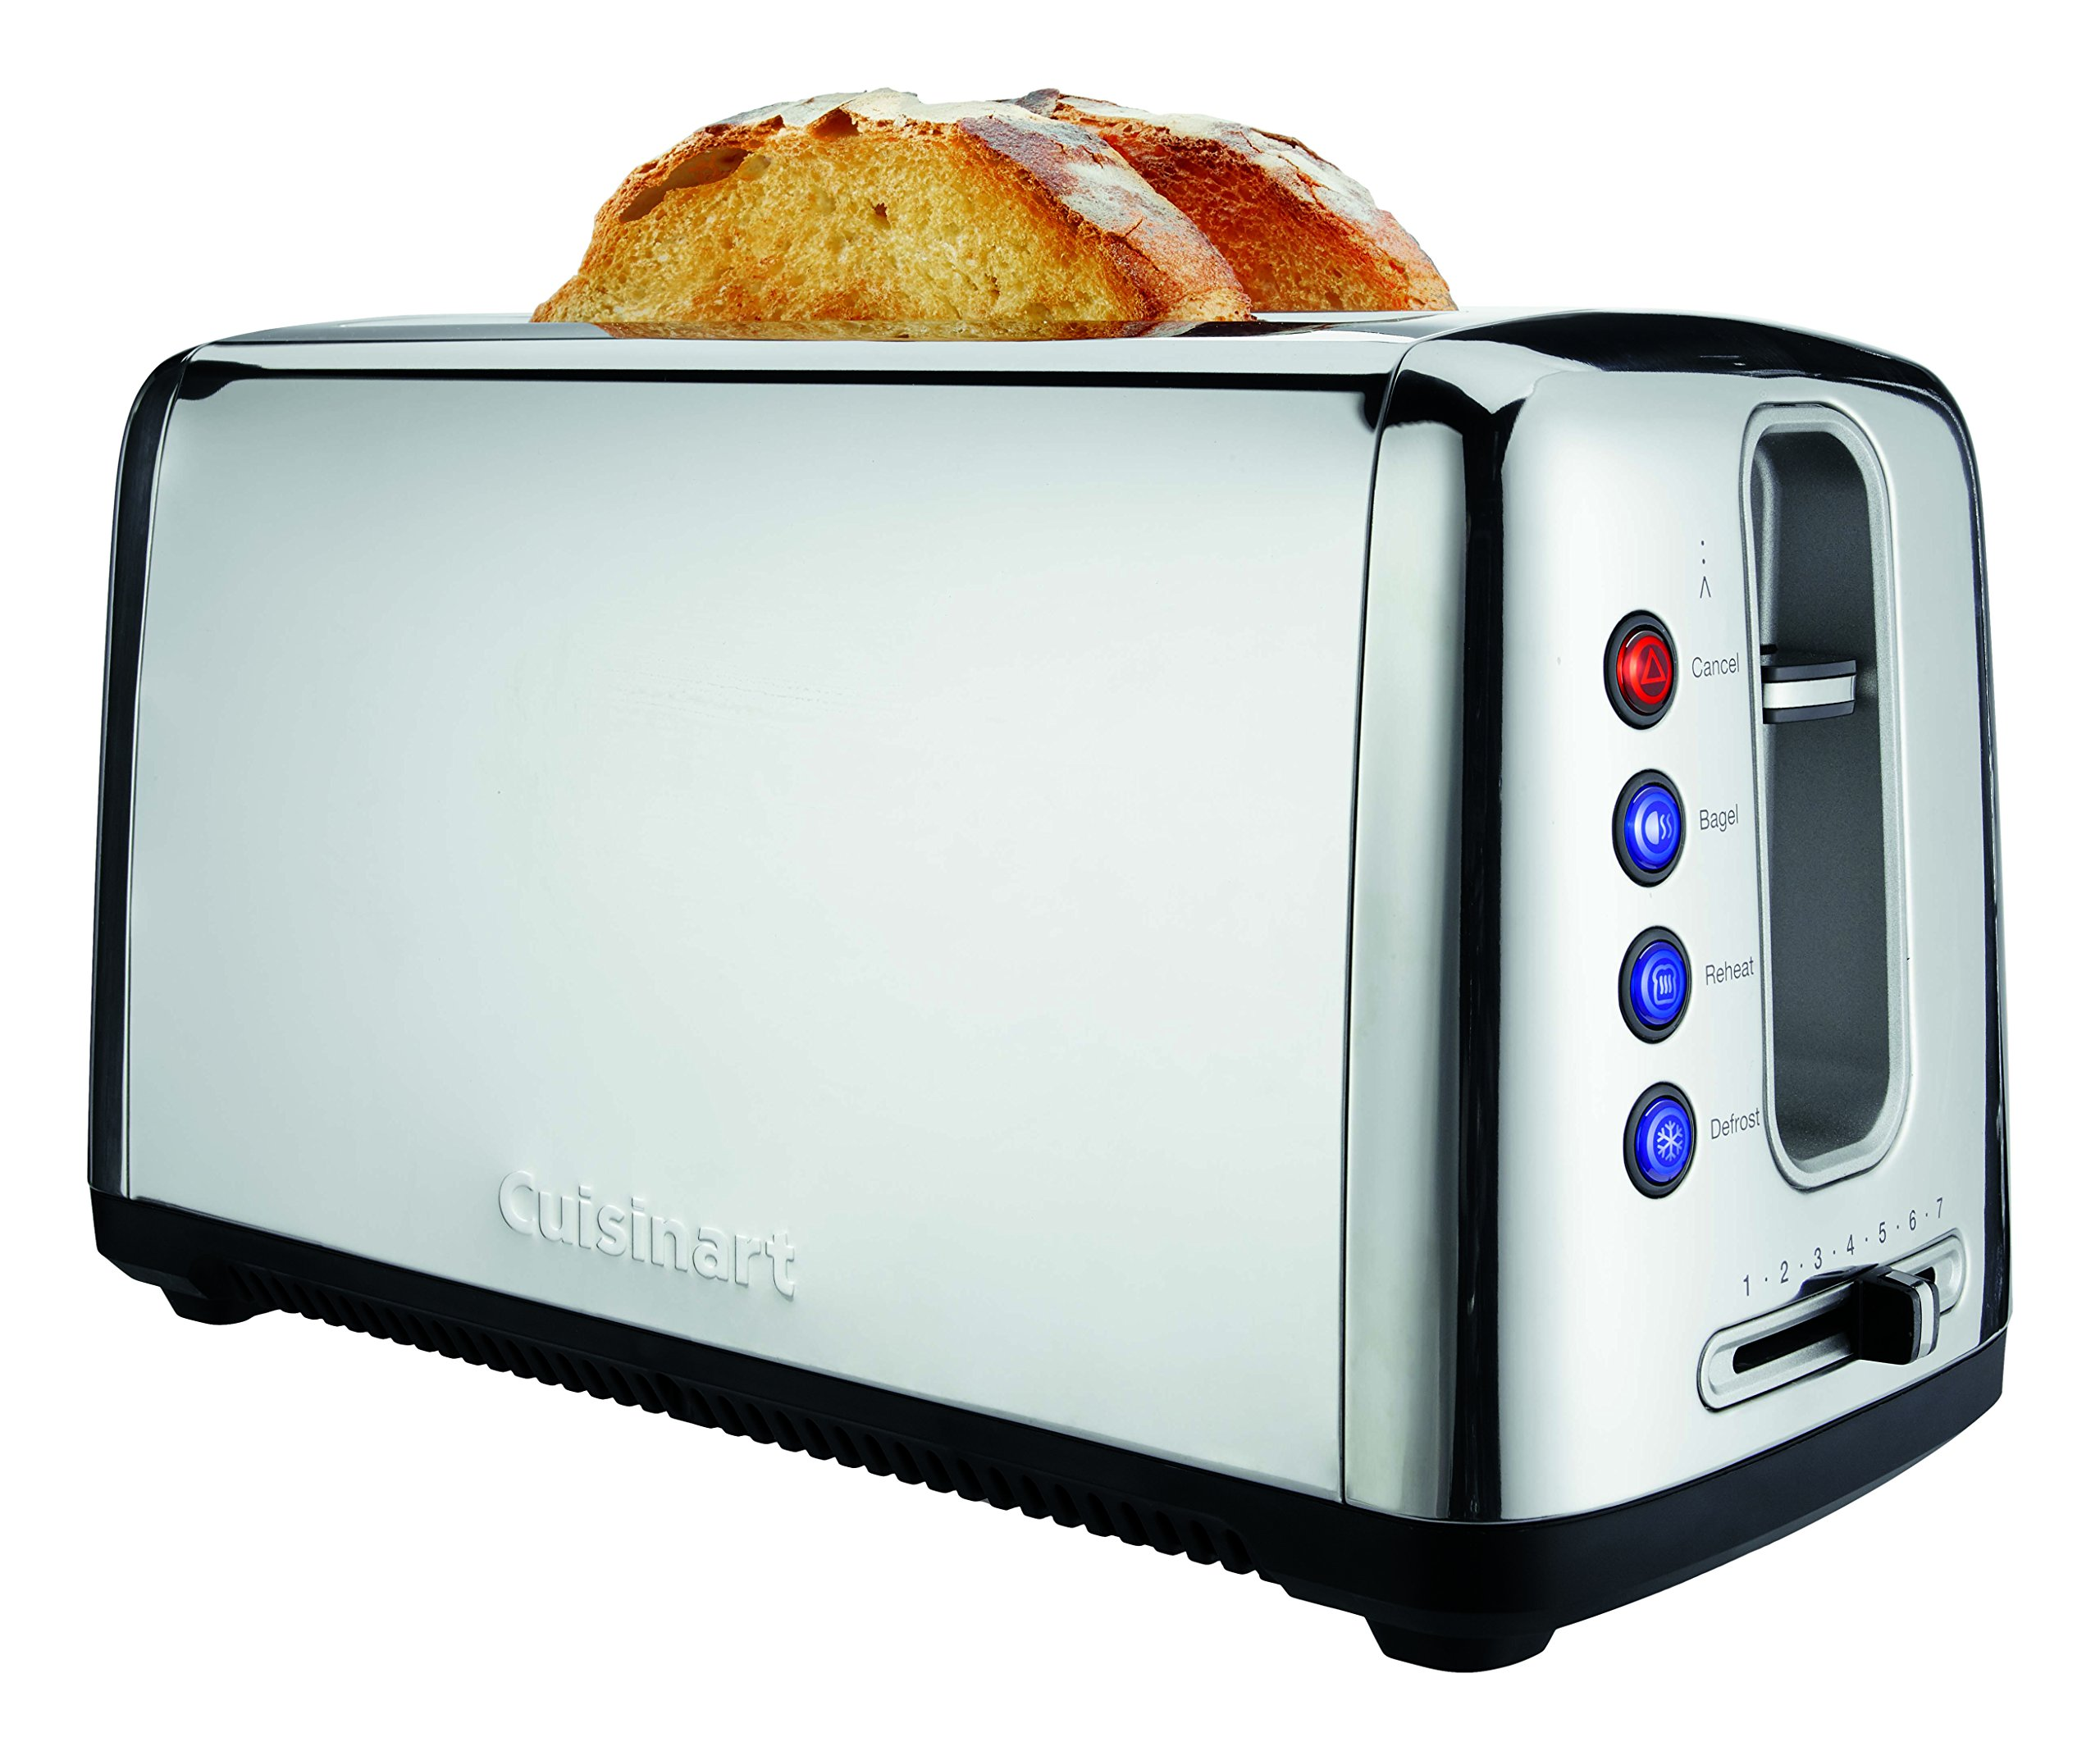 Cuisinart Bakery Artisan Bread Toaster, 2 Slice, Silver